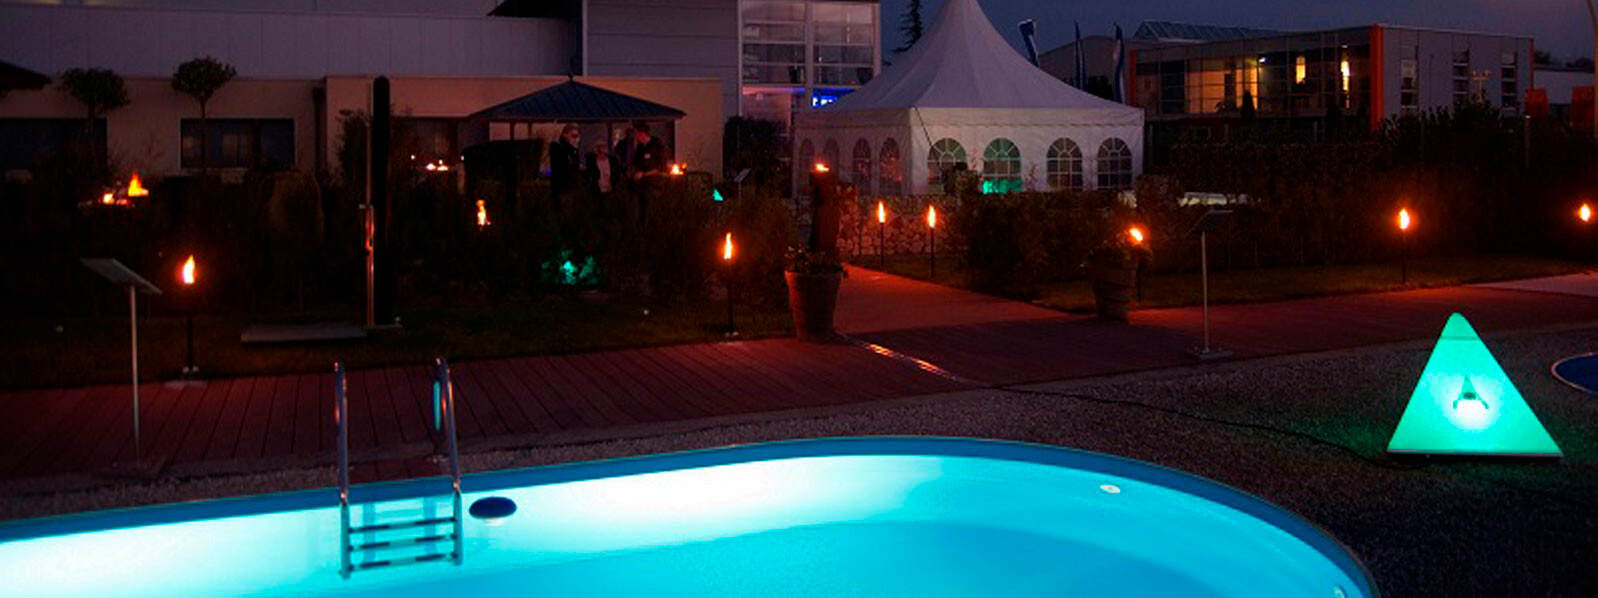 Beleuchteter Pool bei dem Event im Sommer 2015